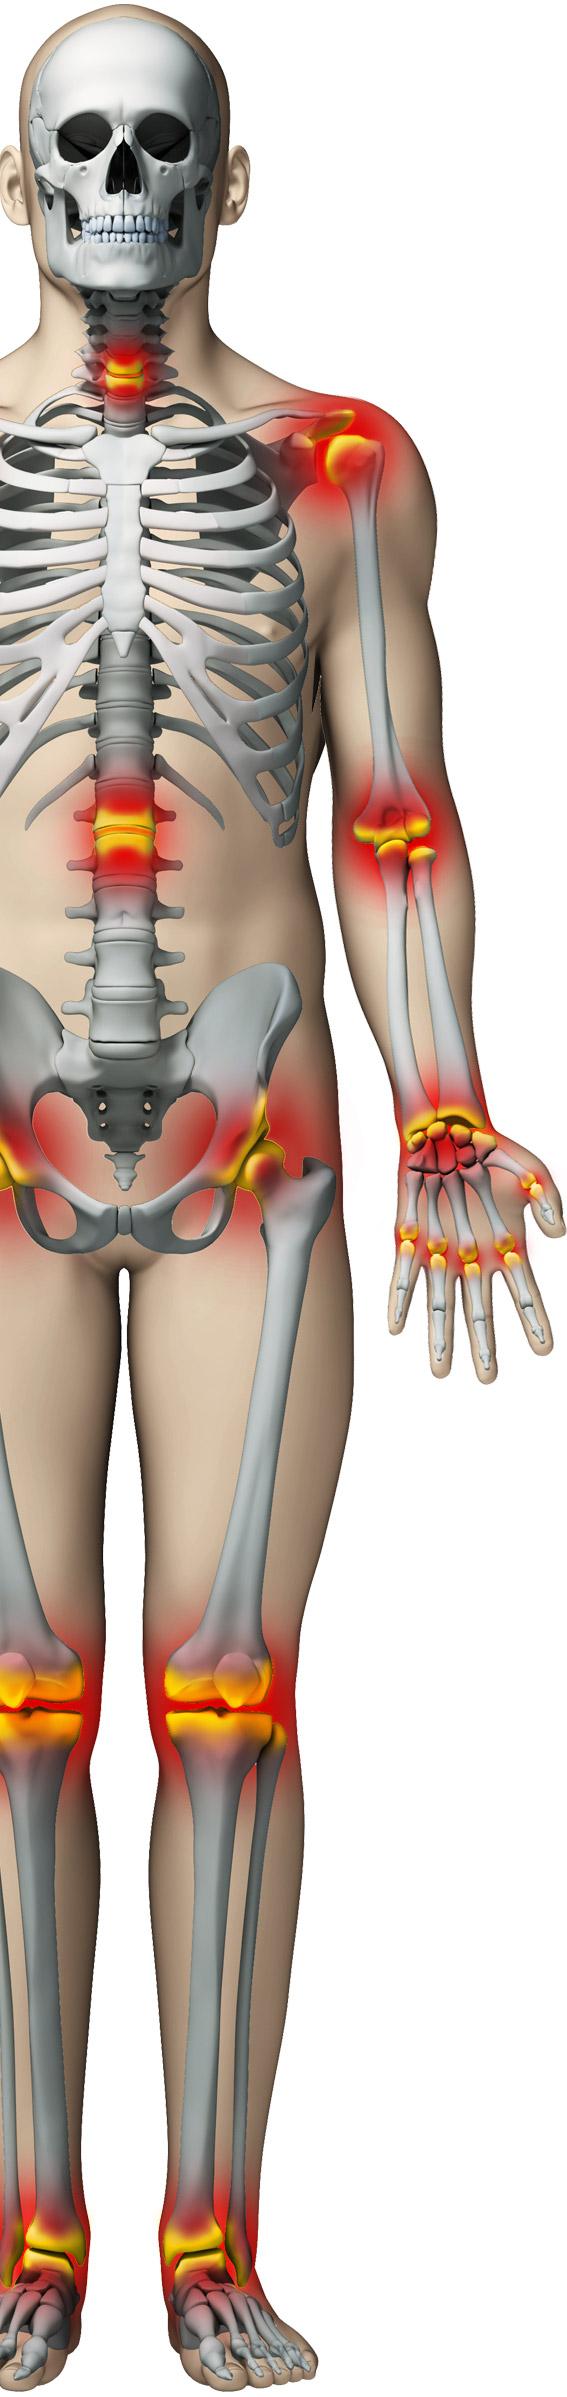 fond de dureri articulare